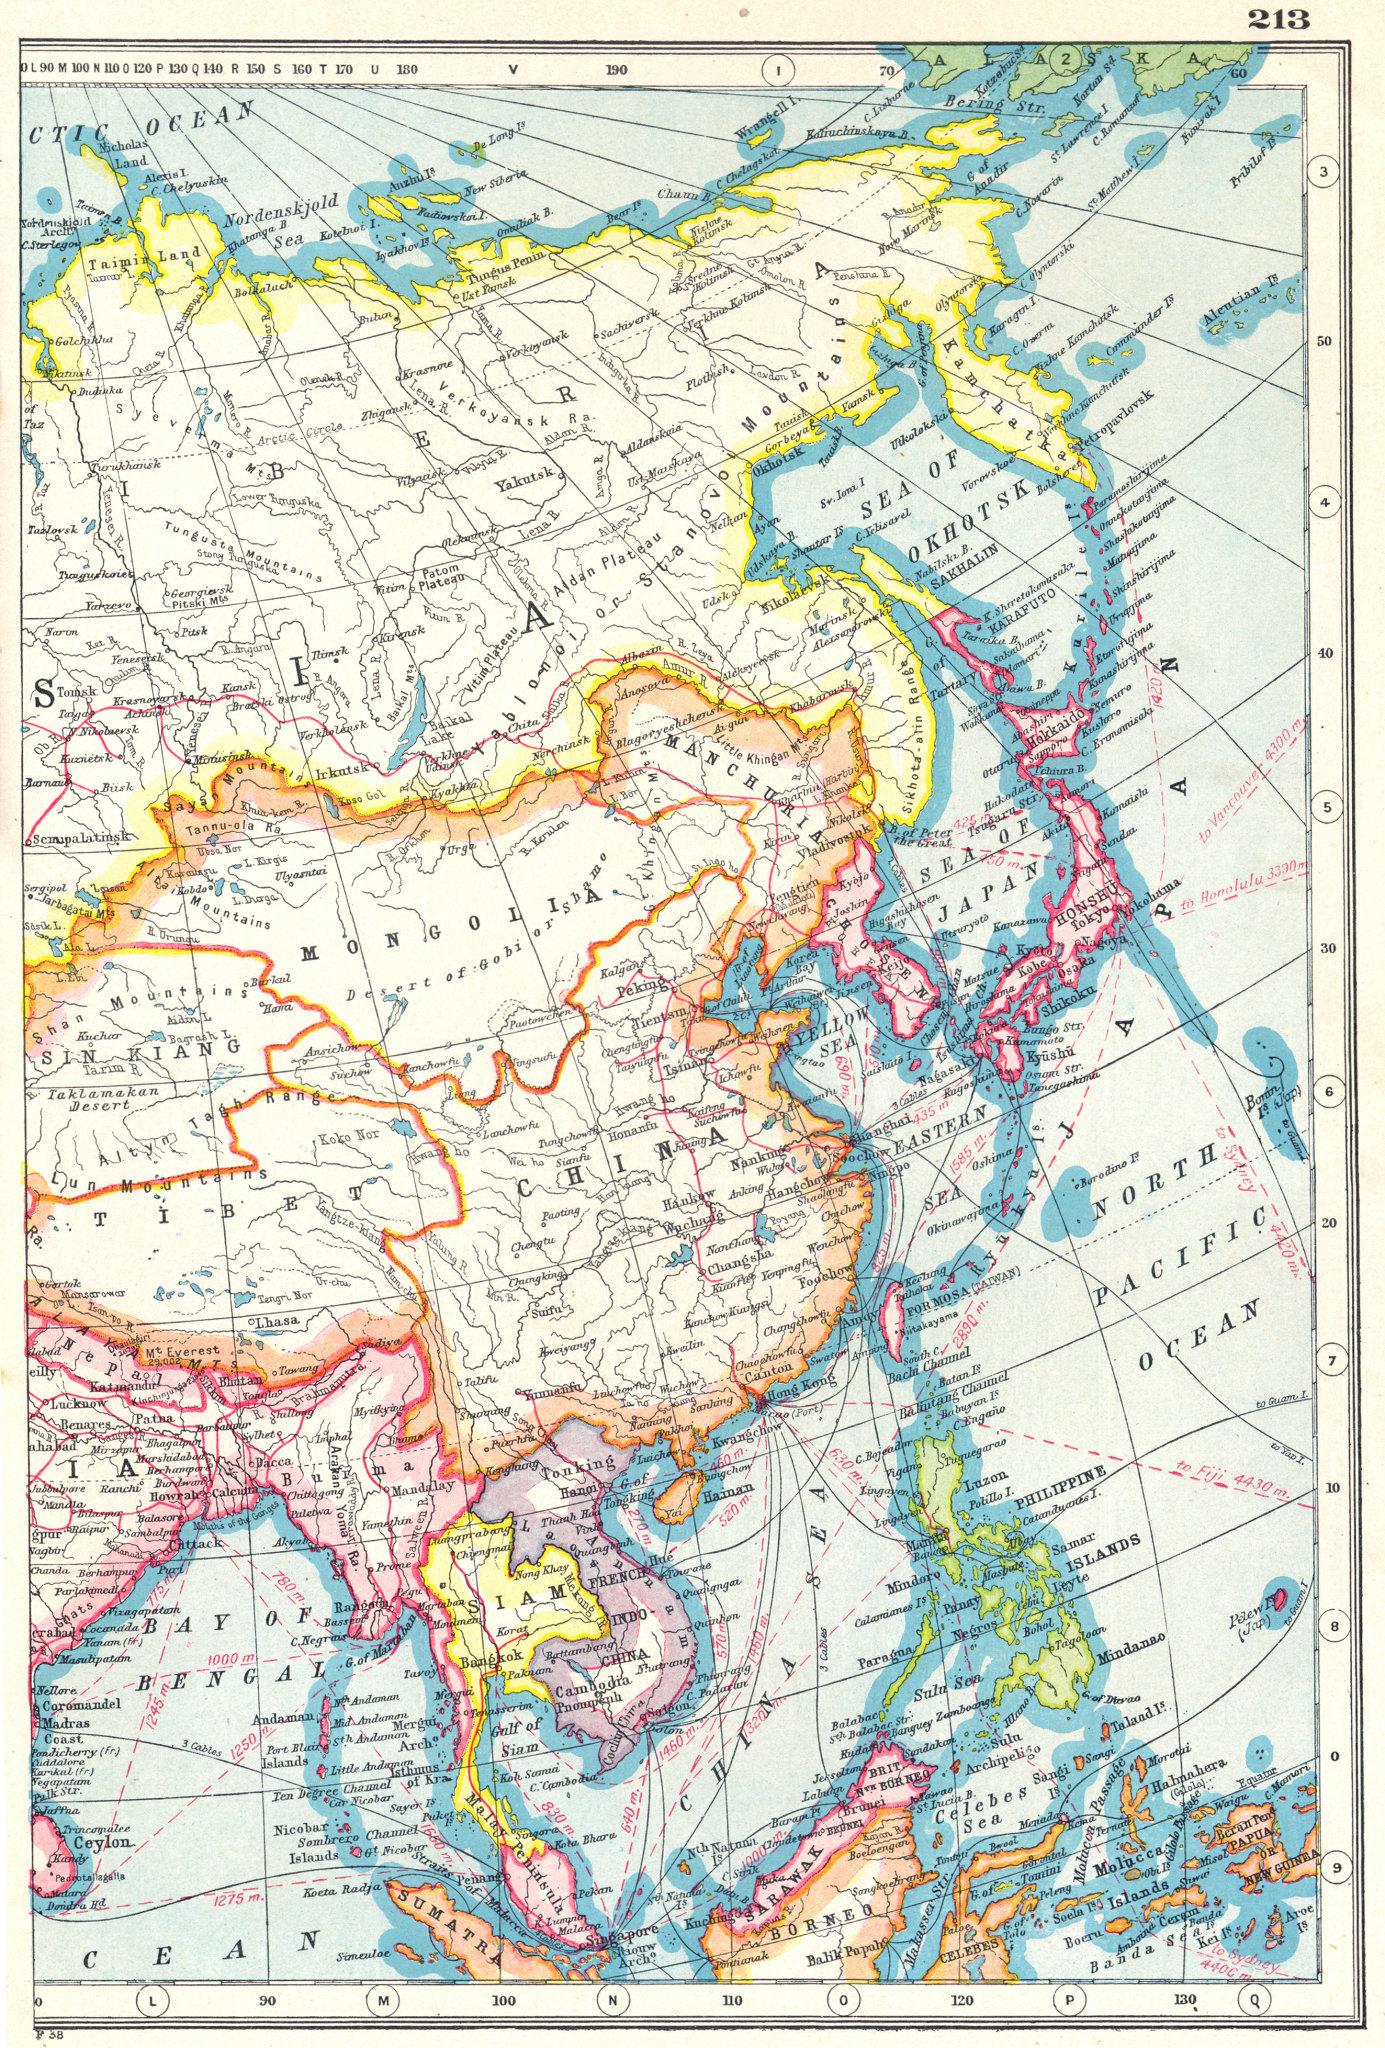 Associate Product EAST ASIA. China Philippines Japan Korea Siam French Indochina Malaya 1920 map